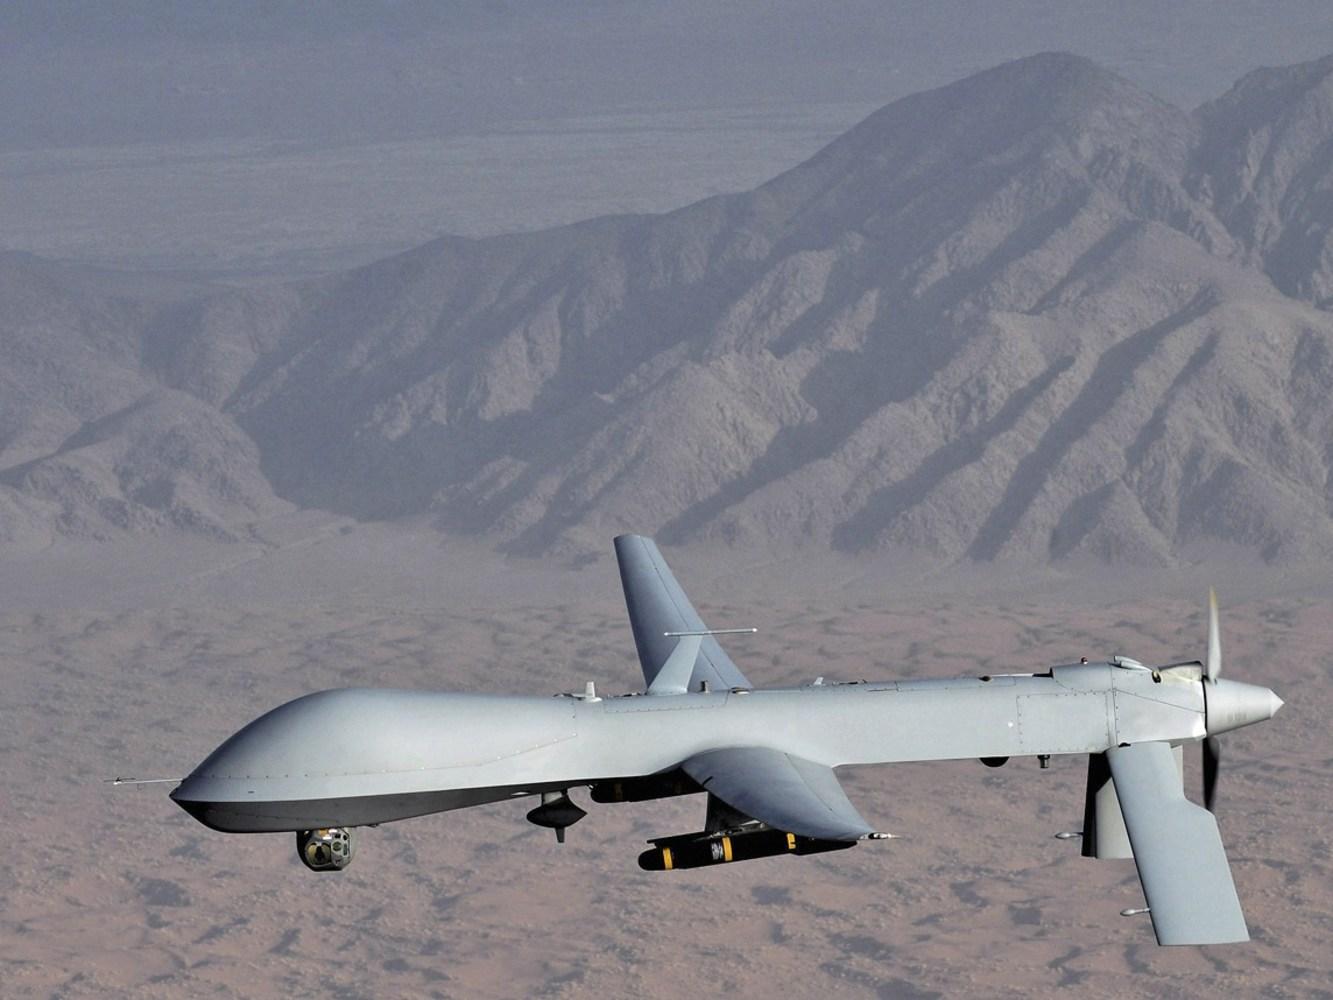 1c6457451-130313-drone-02.nbcnews-ux-2880-1000.jpg